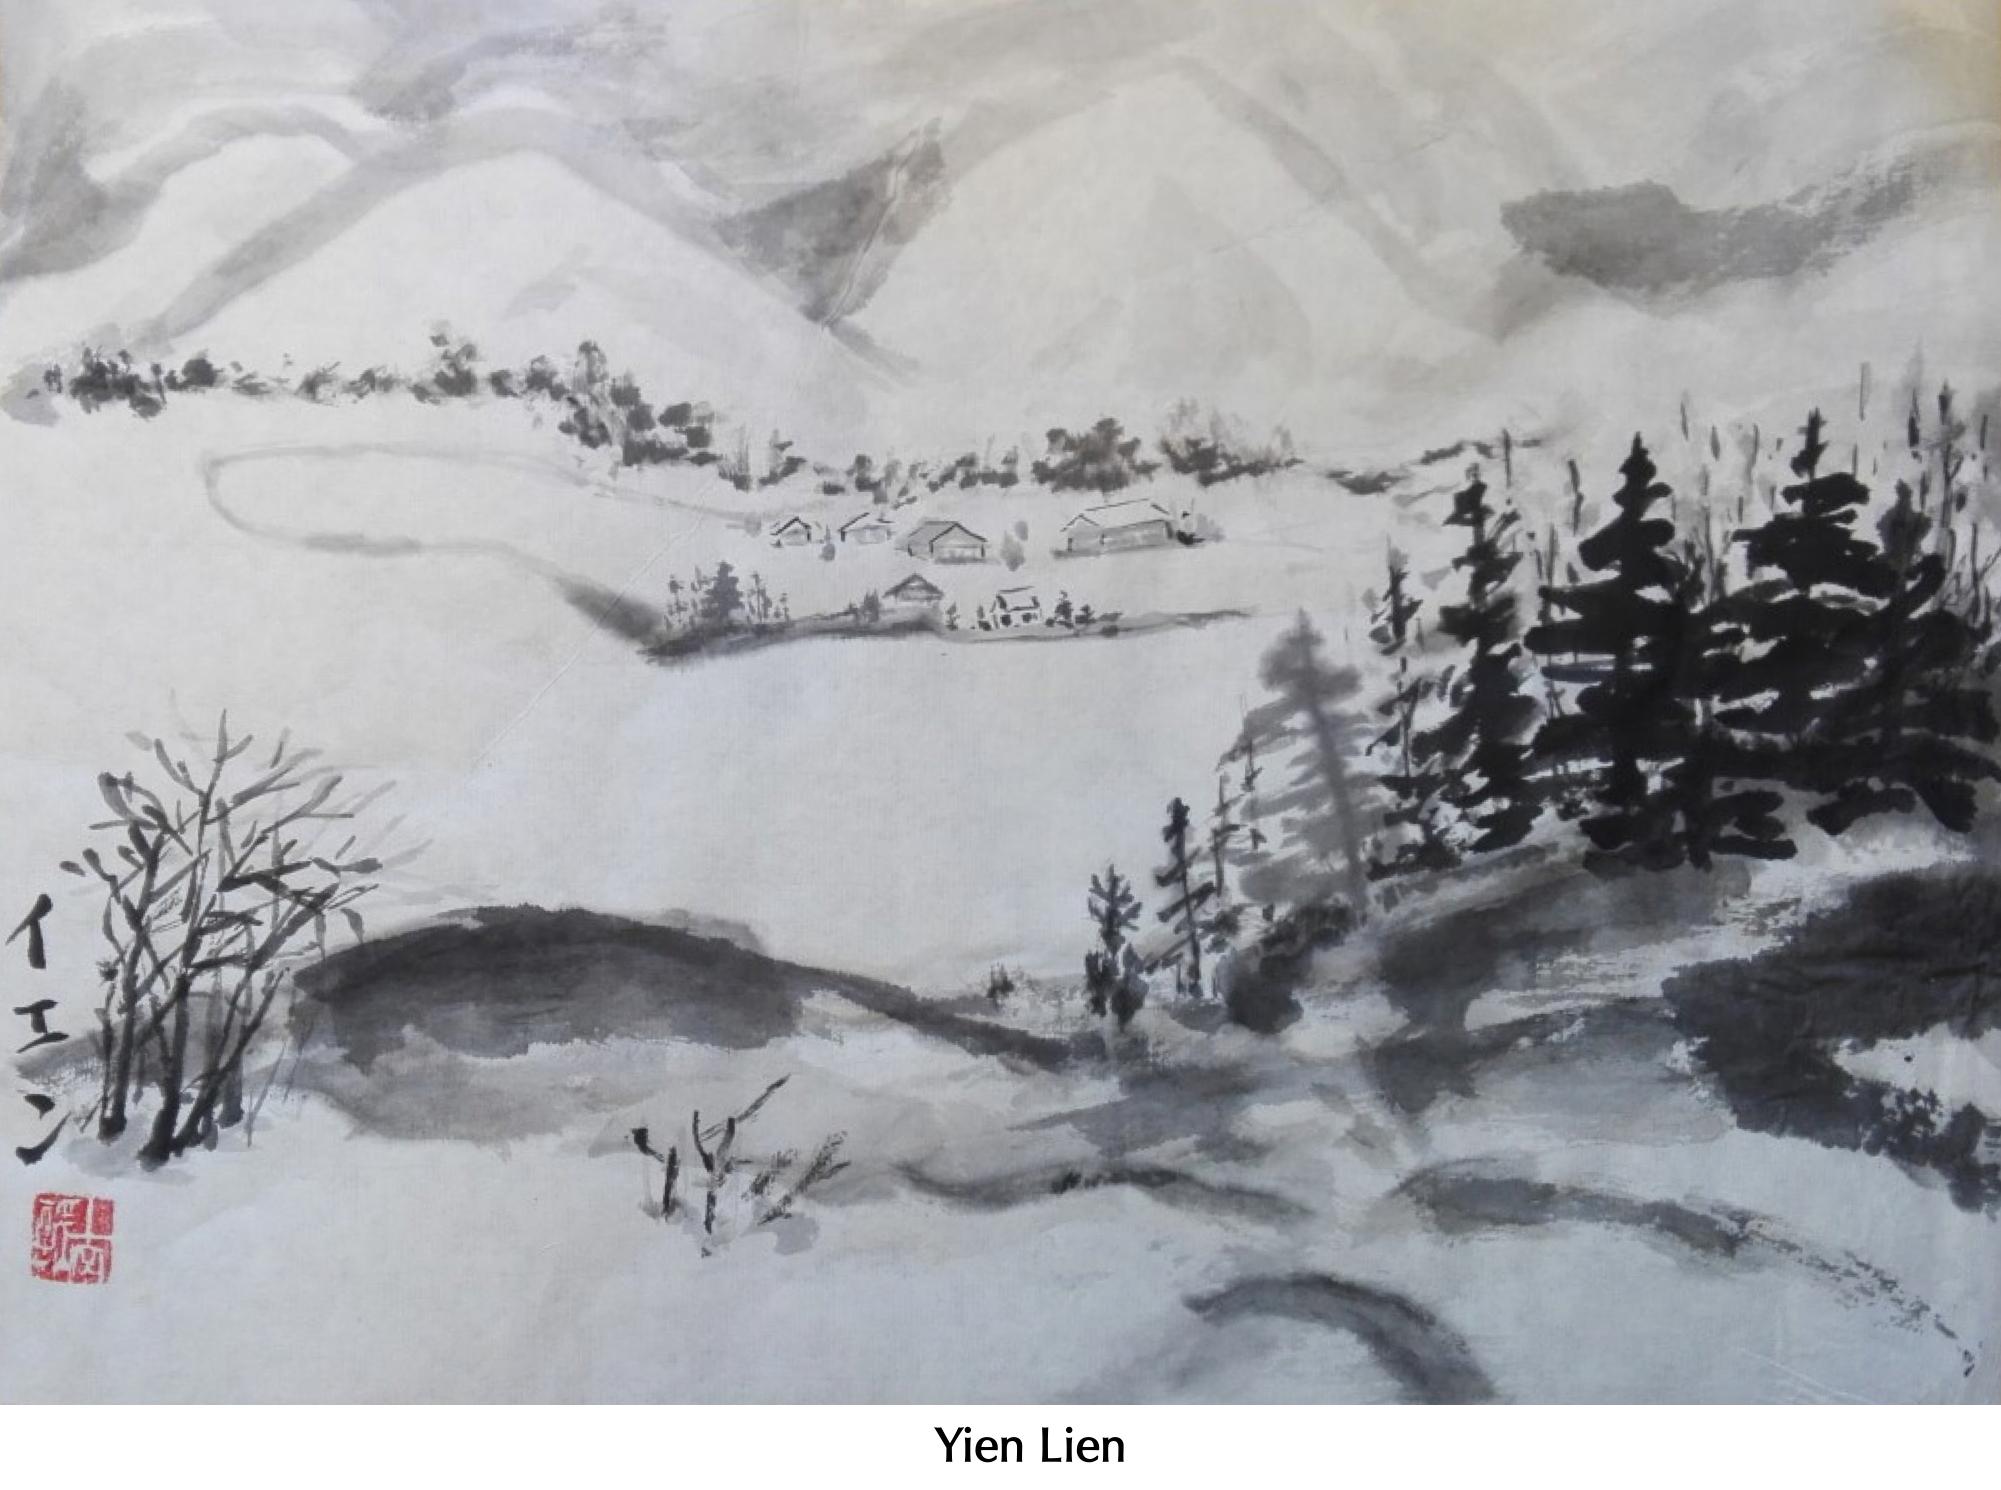 Yien Lien